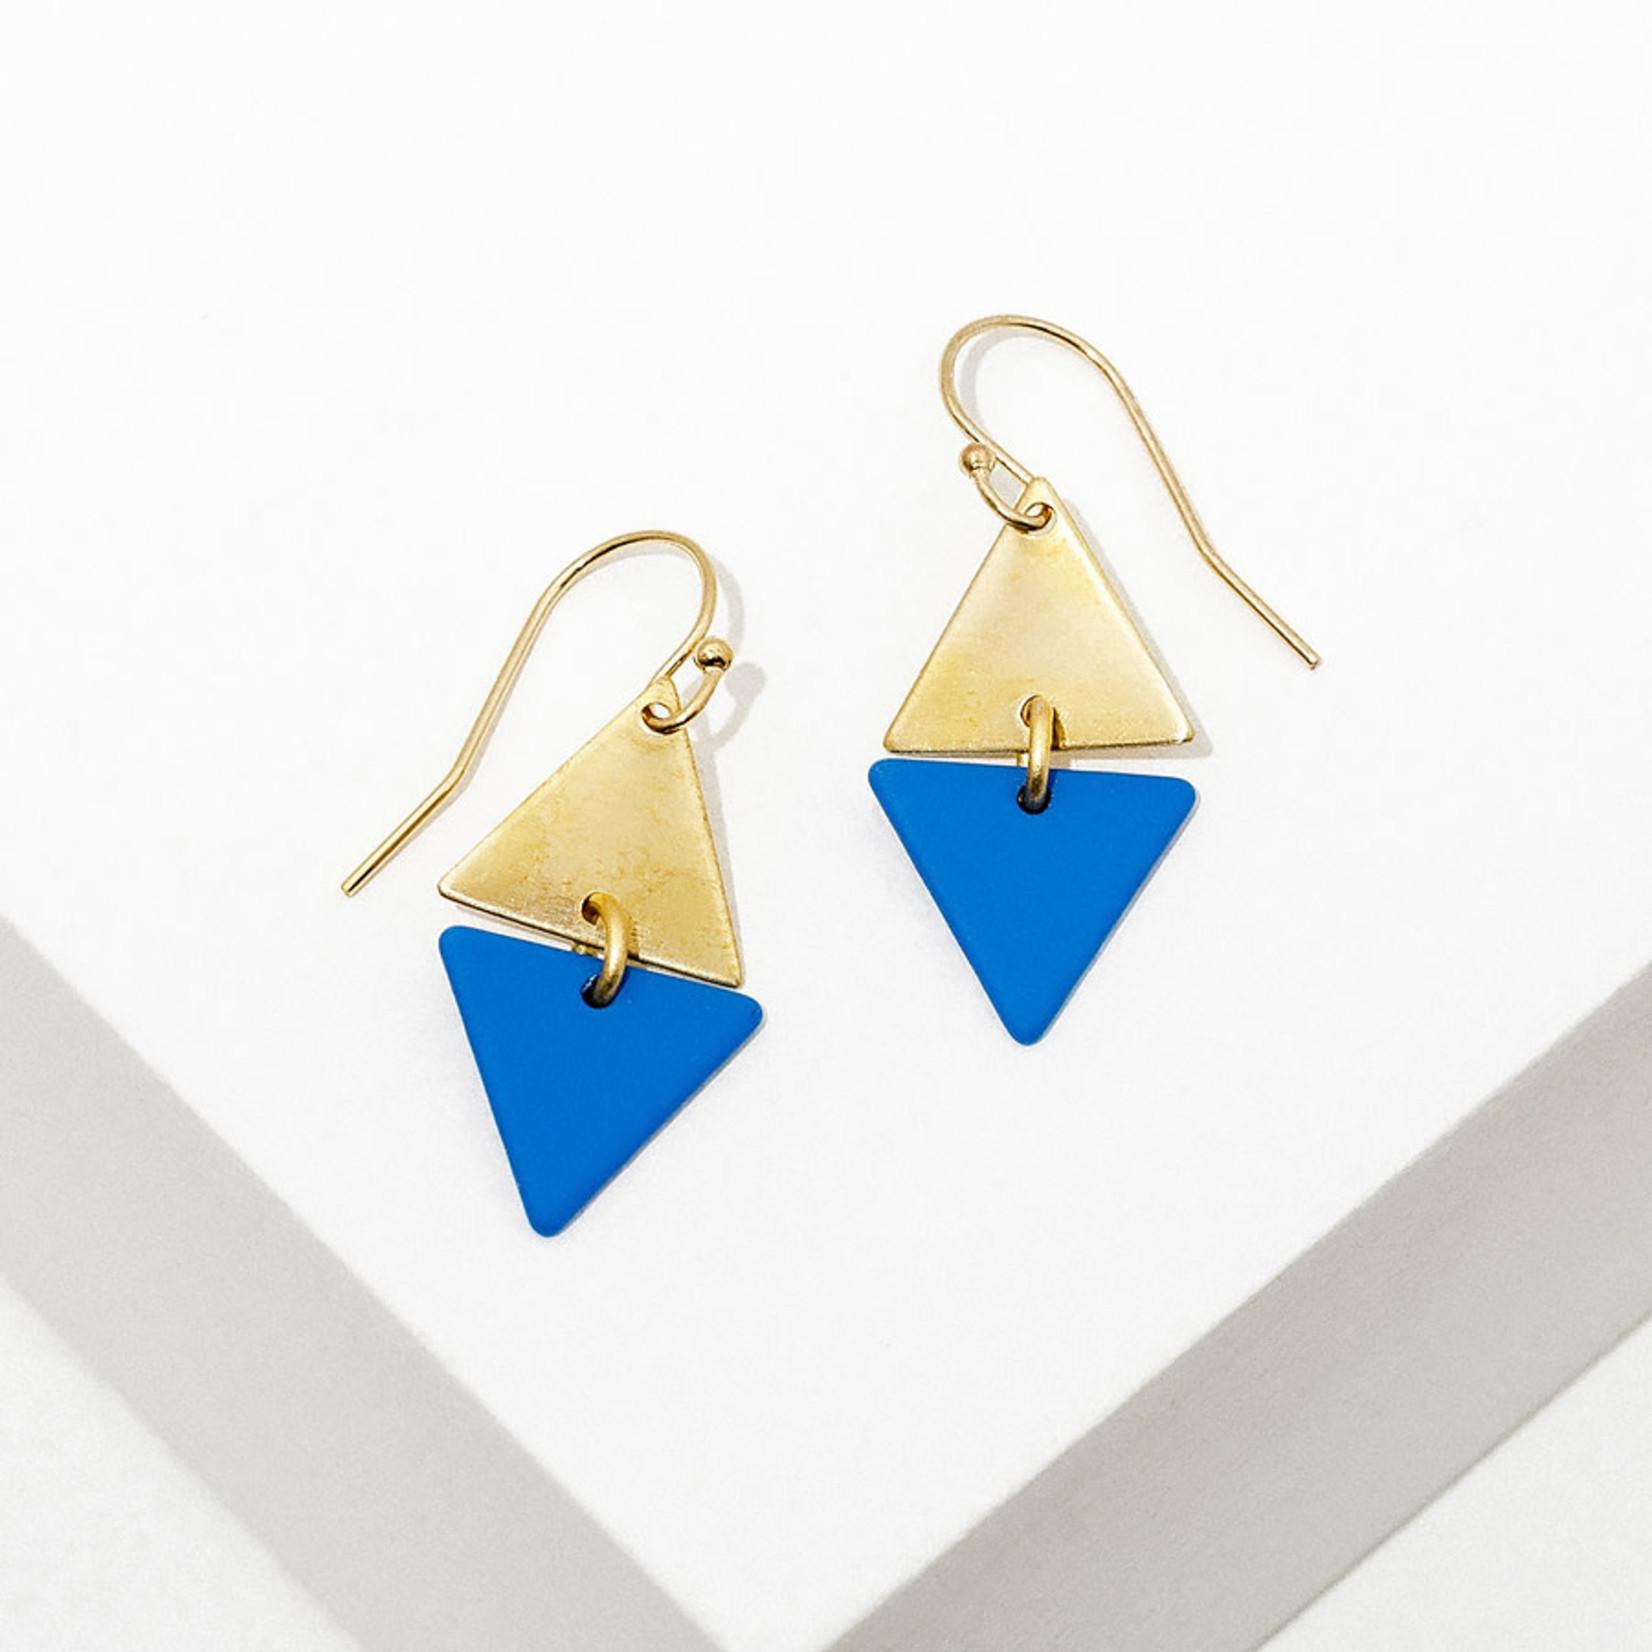 Larissa Loden Alta Earrings